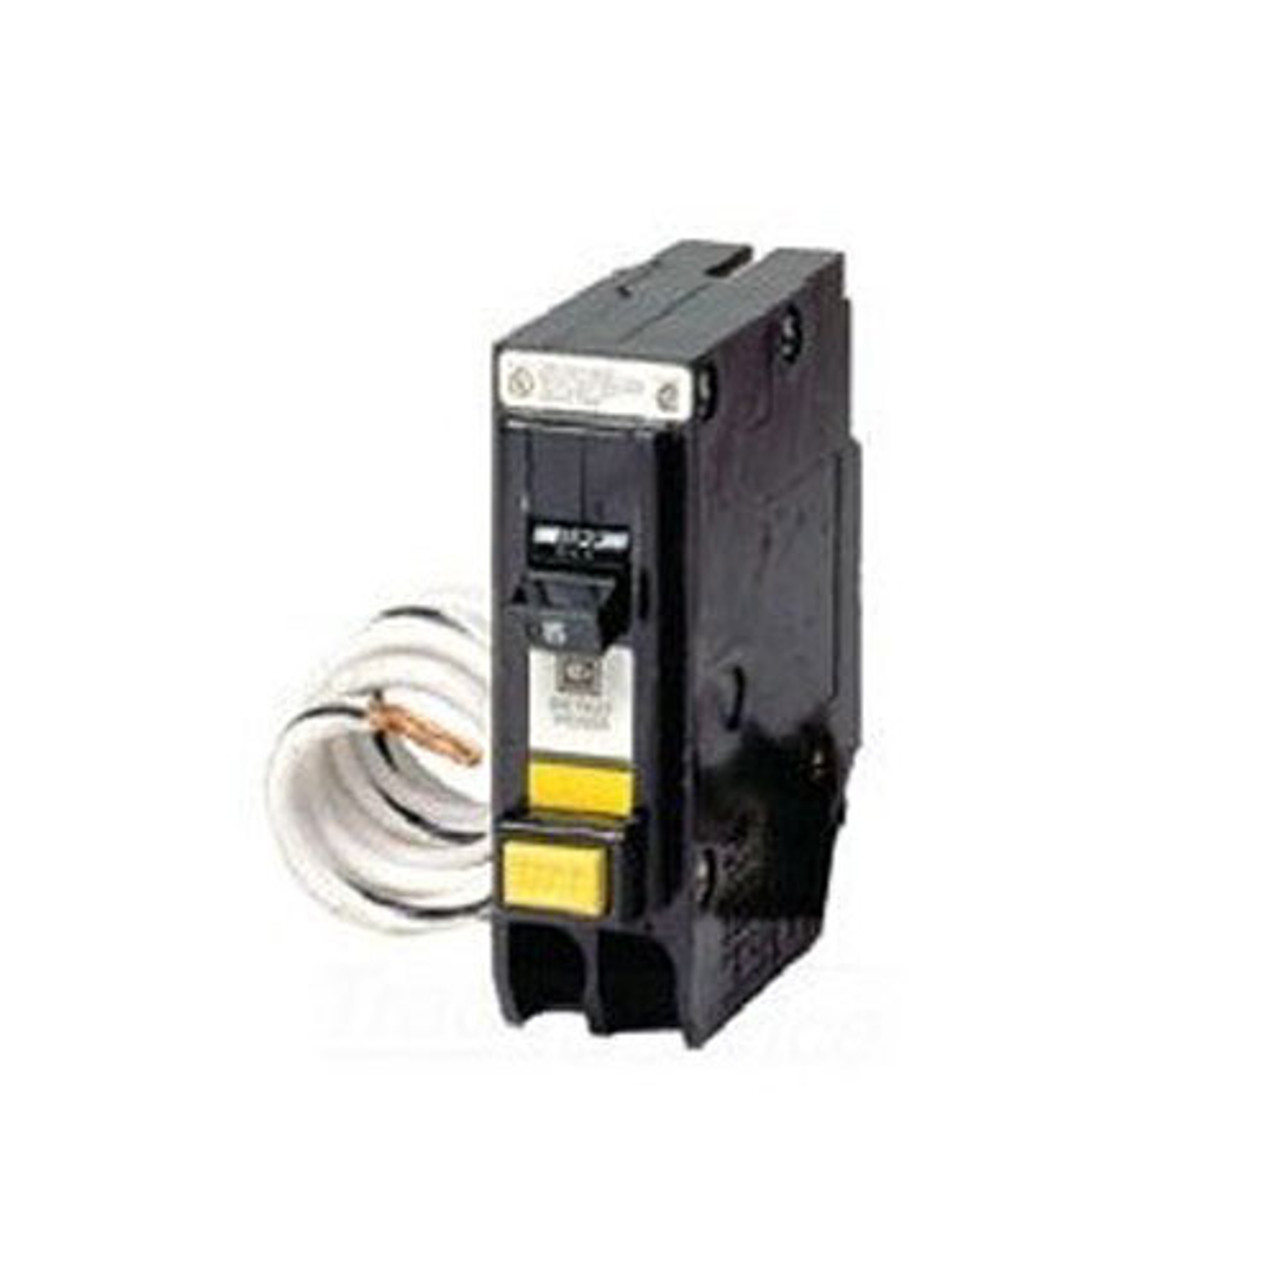 Cutler Hammer BRCAF115CS 1 Pole 15 Amp Compact AF Circuit Breaker - New